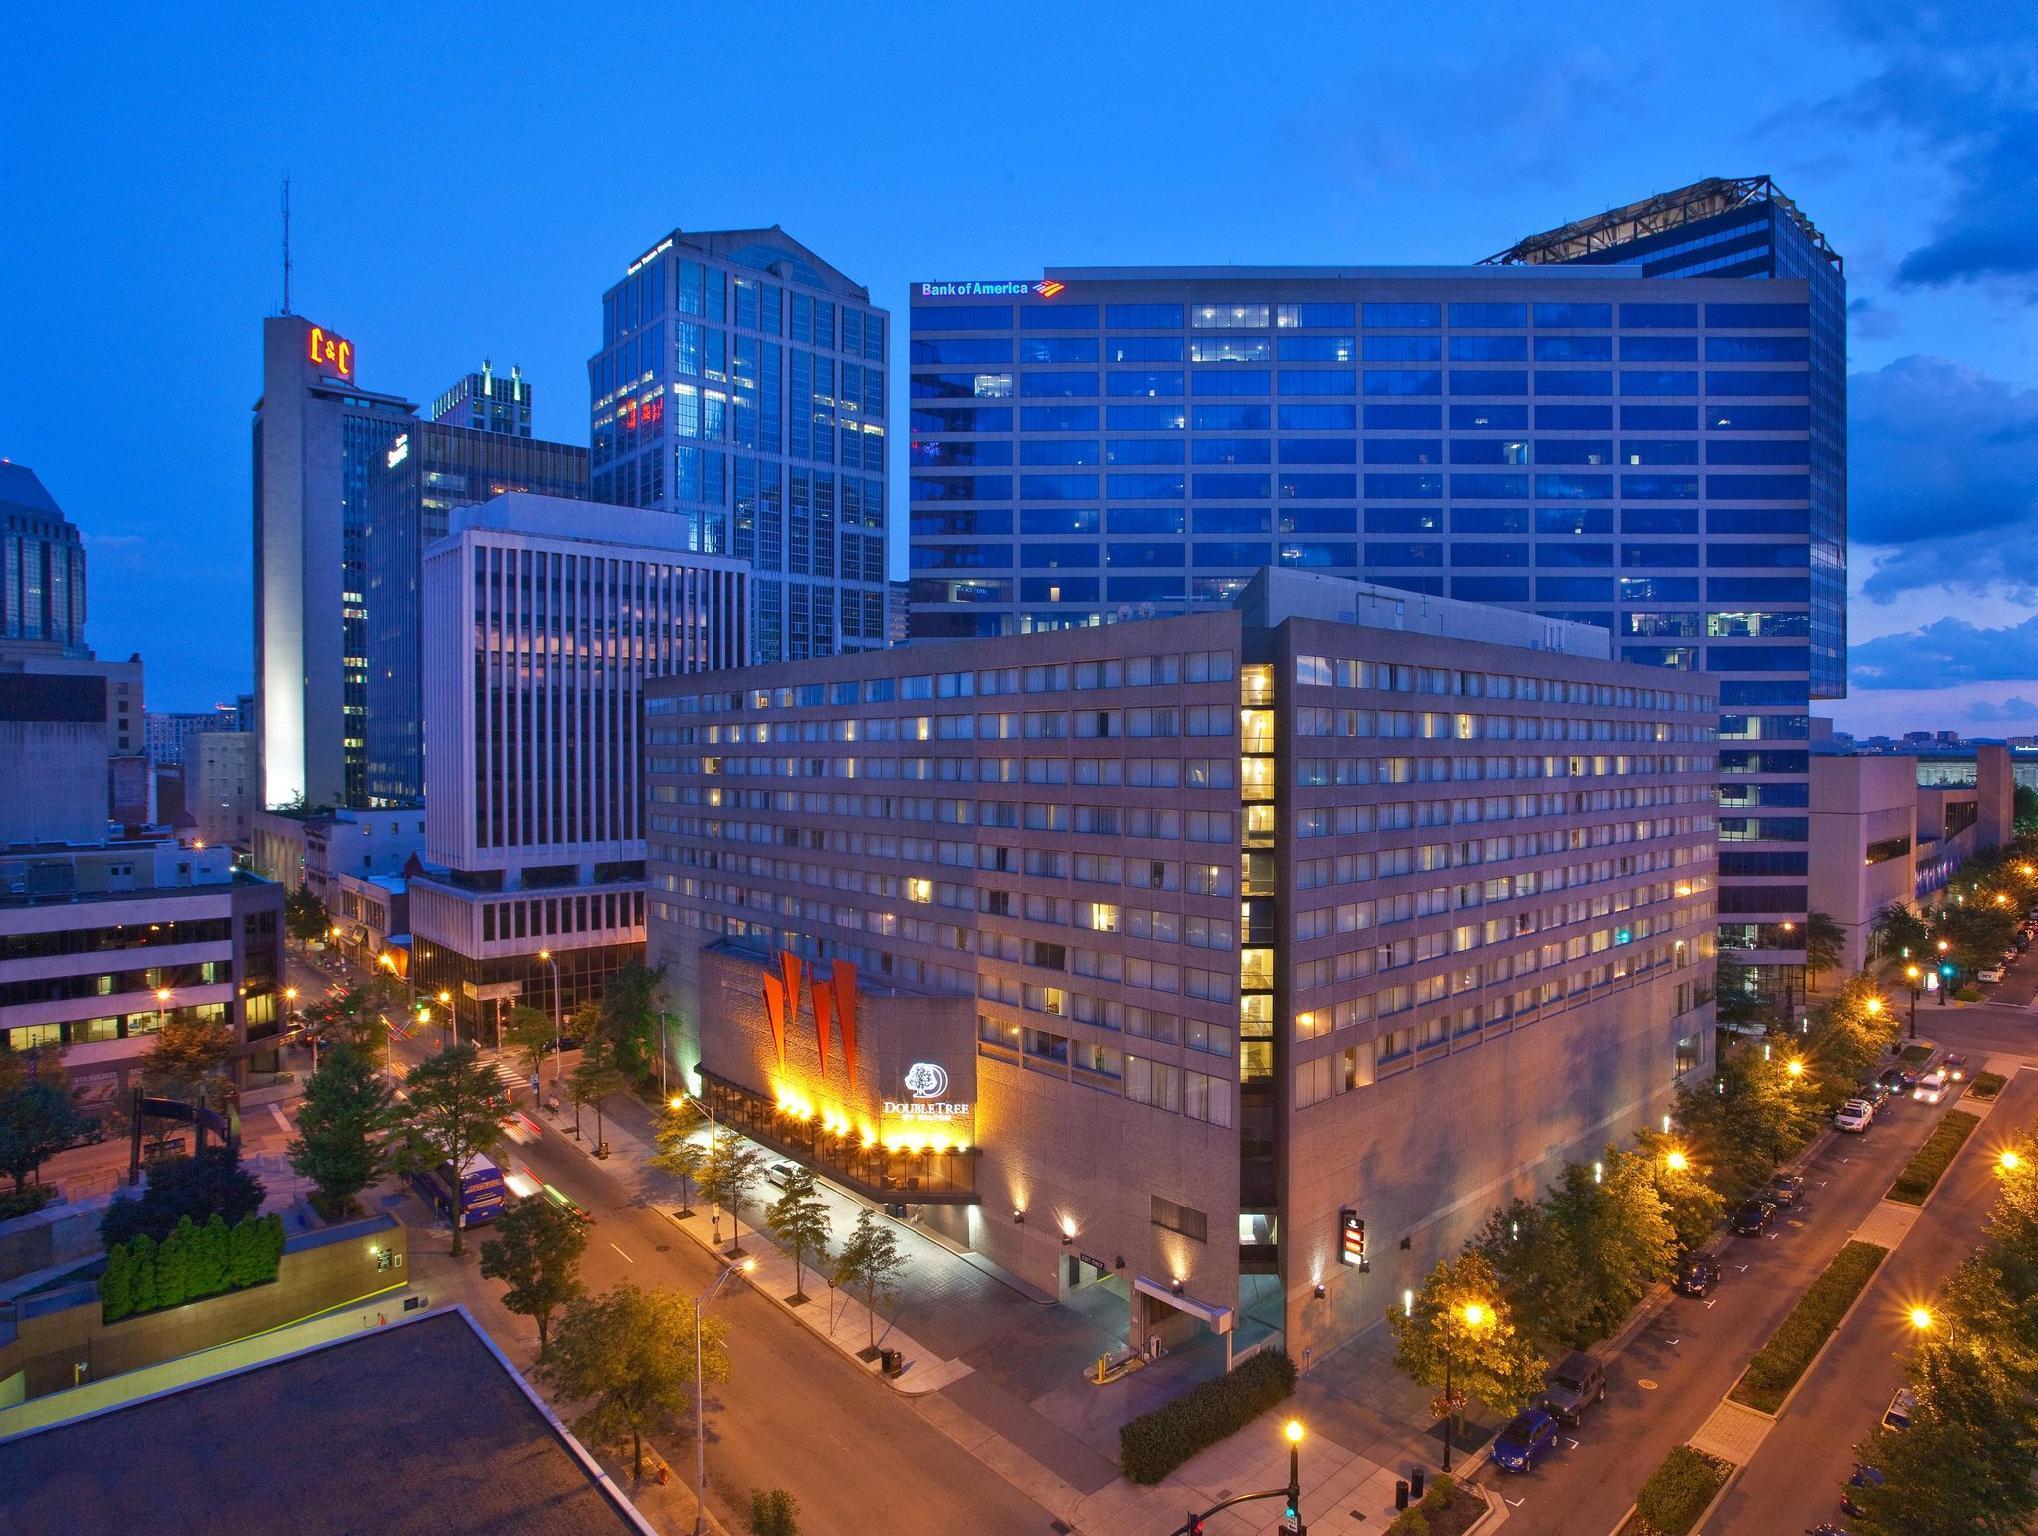 Doubletree By Hilton Downtown Nashville Hotel